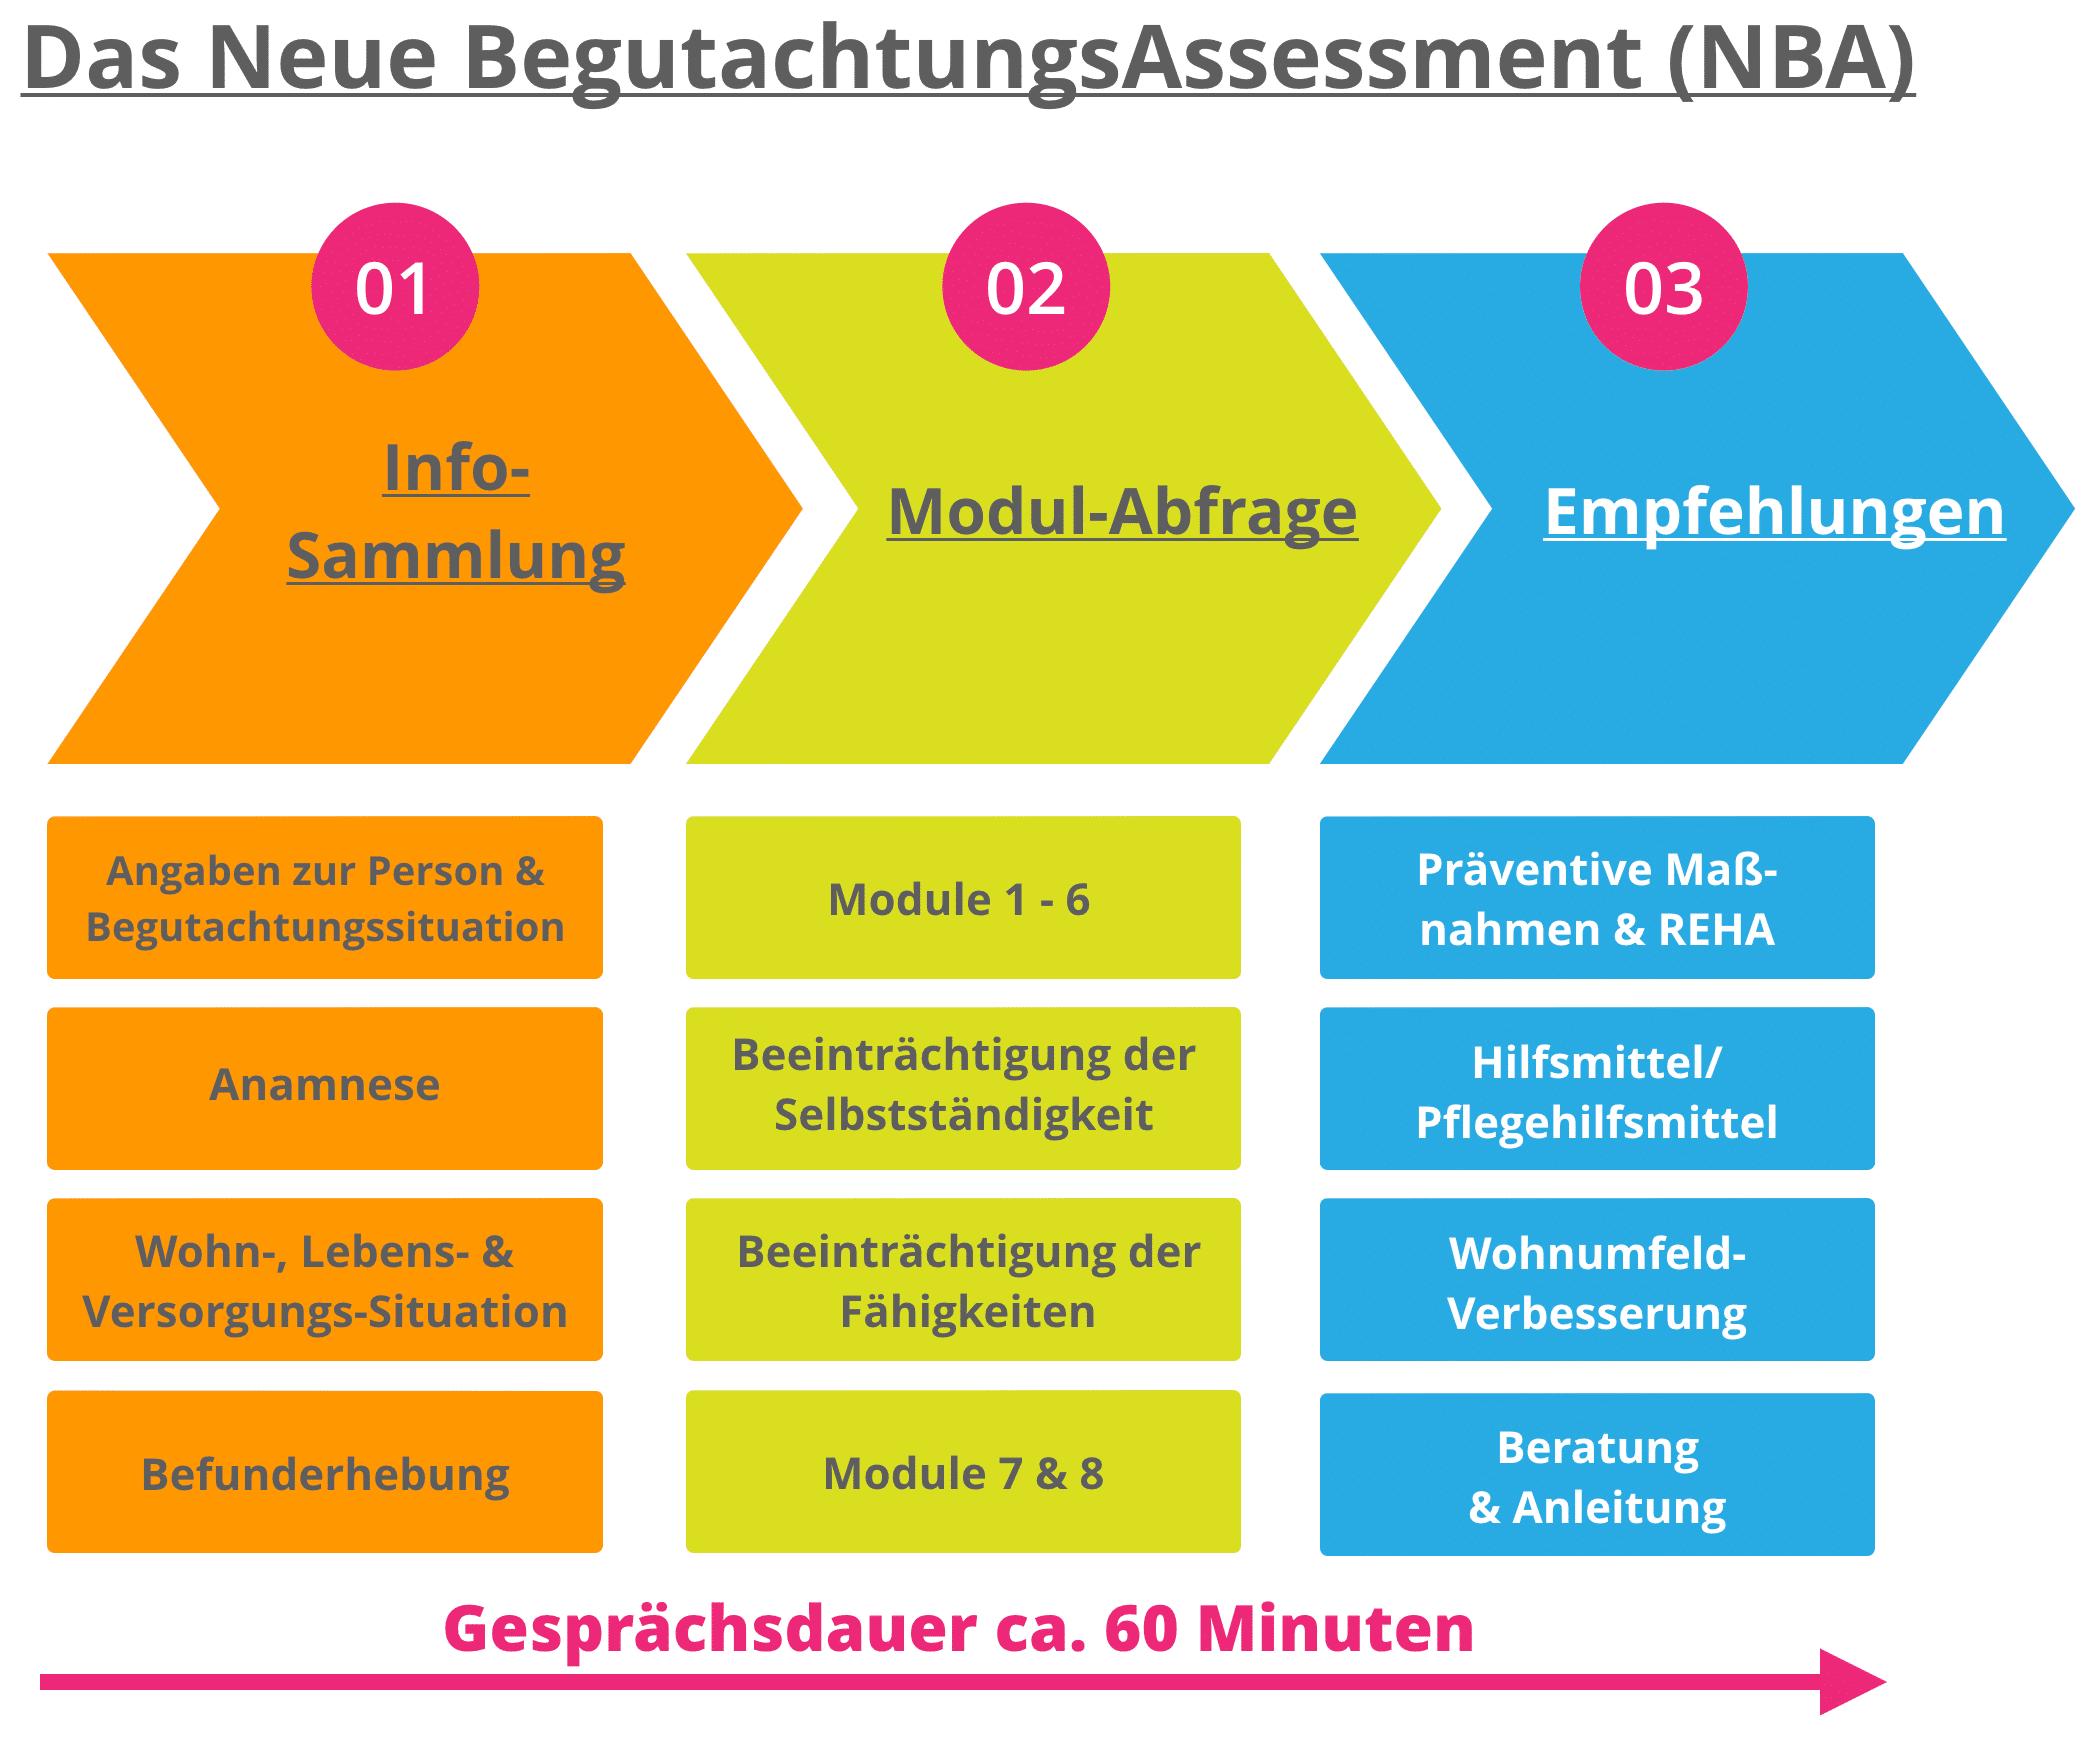 Pflegegrad Bestimmung im 3 Säulen-Prozess des Neuen Begutachtungsassessment